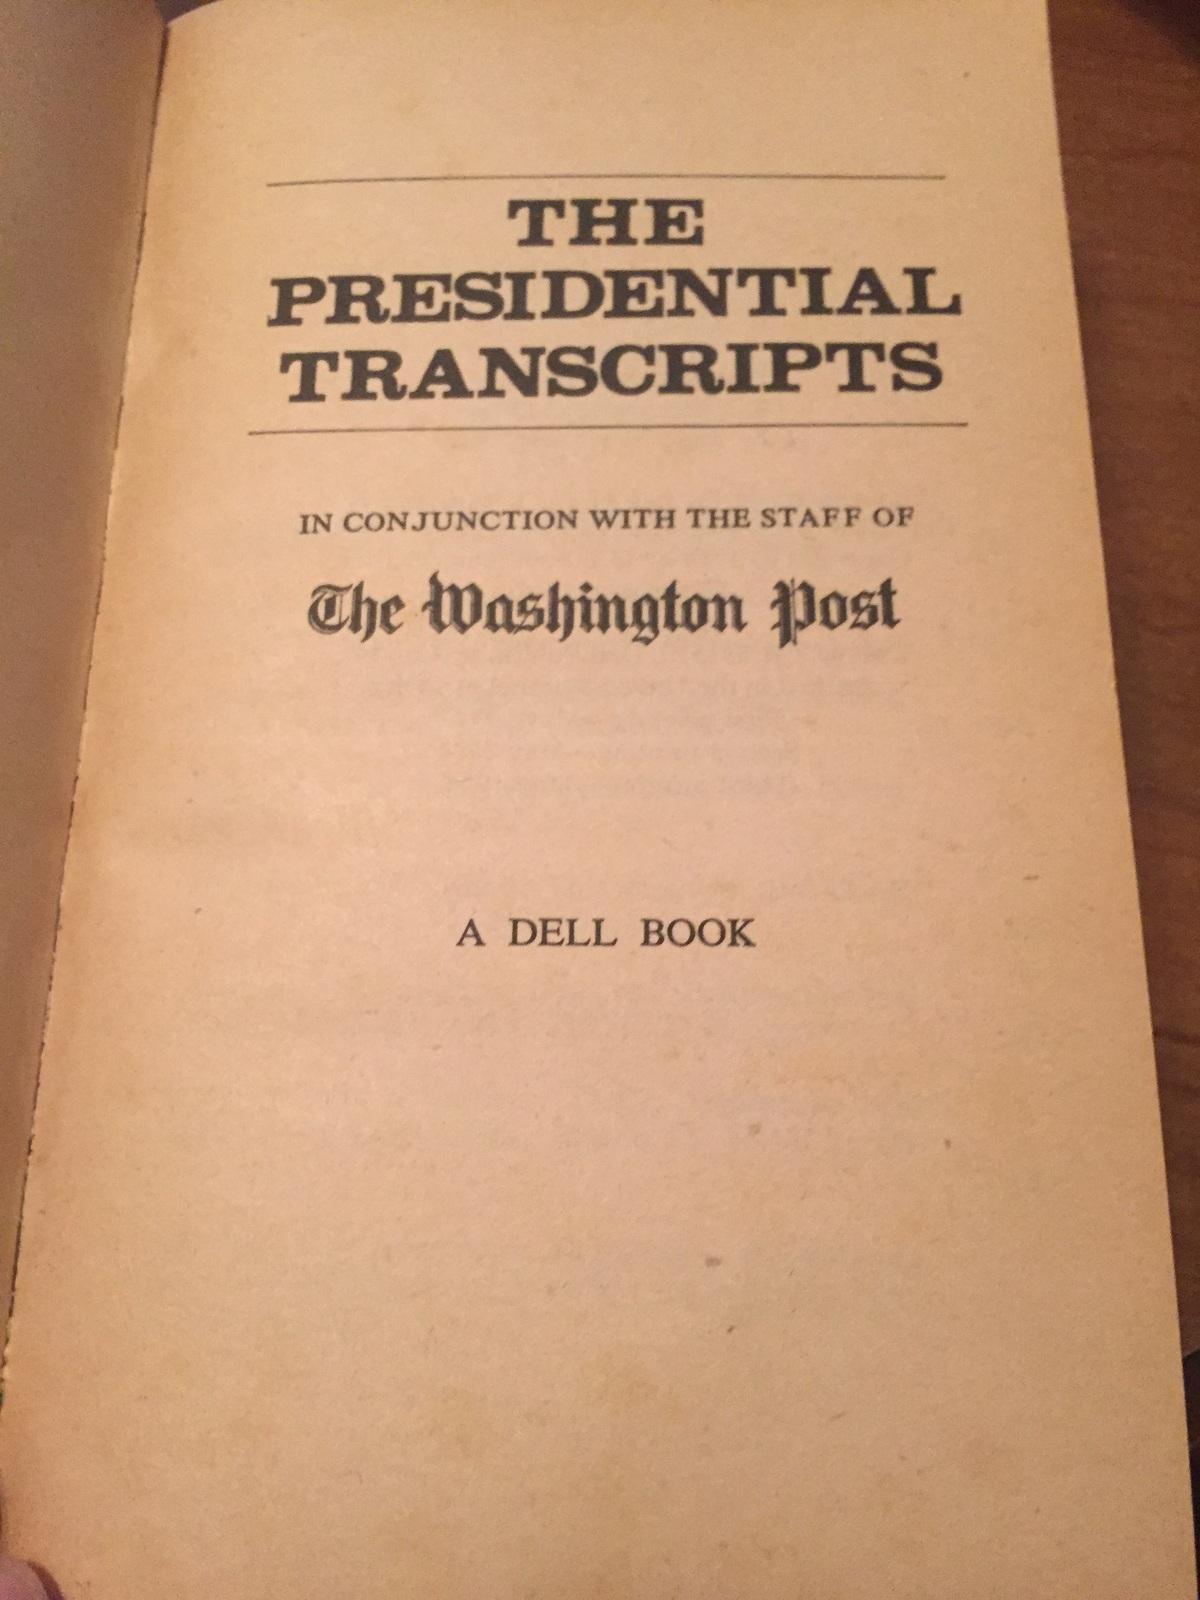 The Presidential Transcripts jvc144